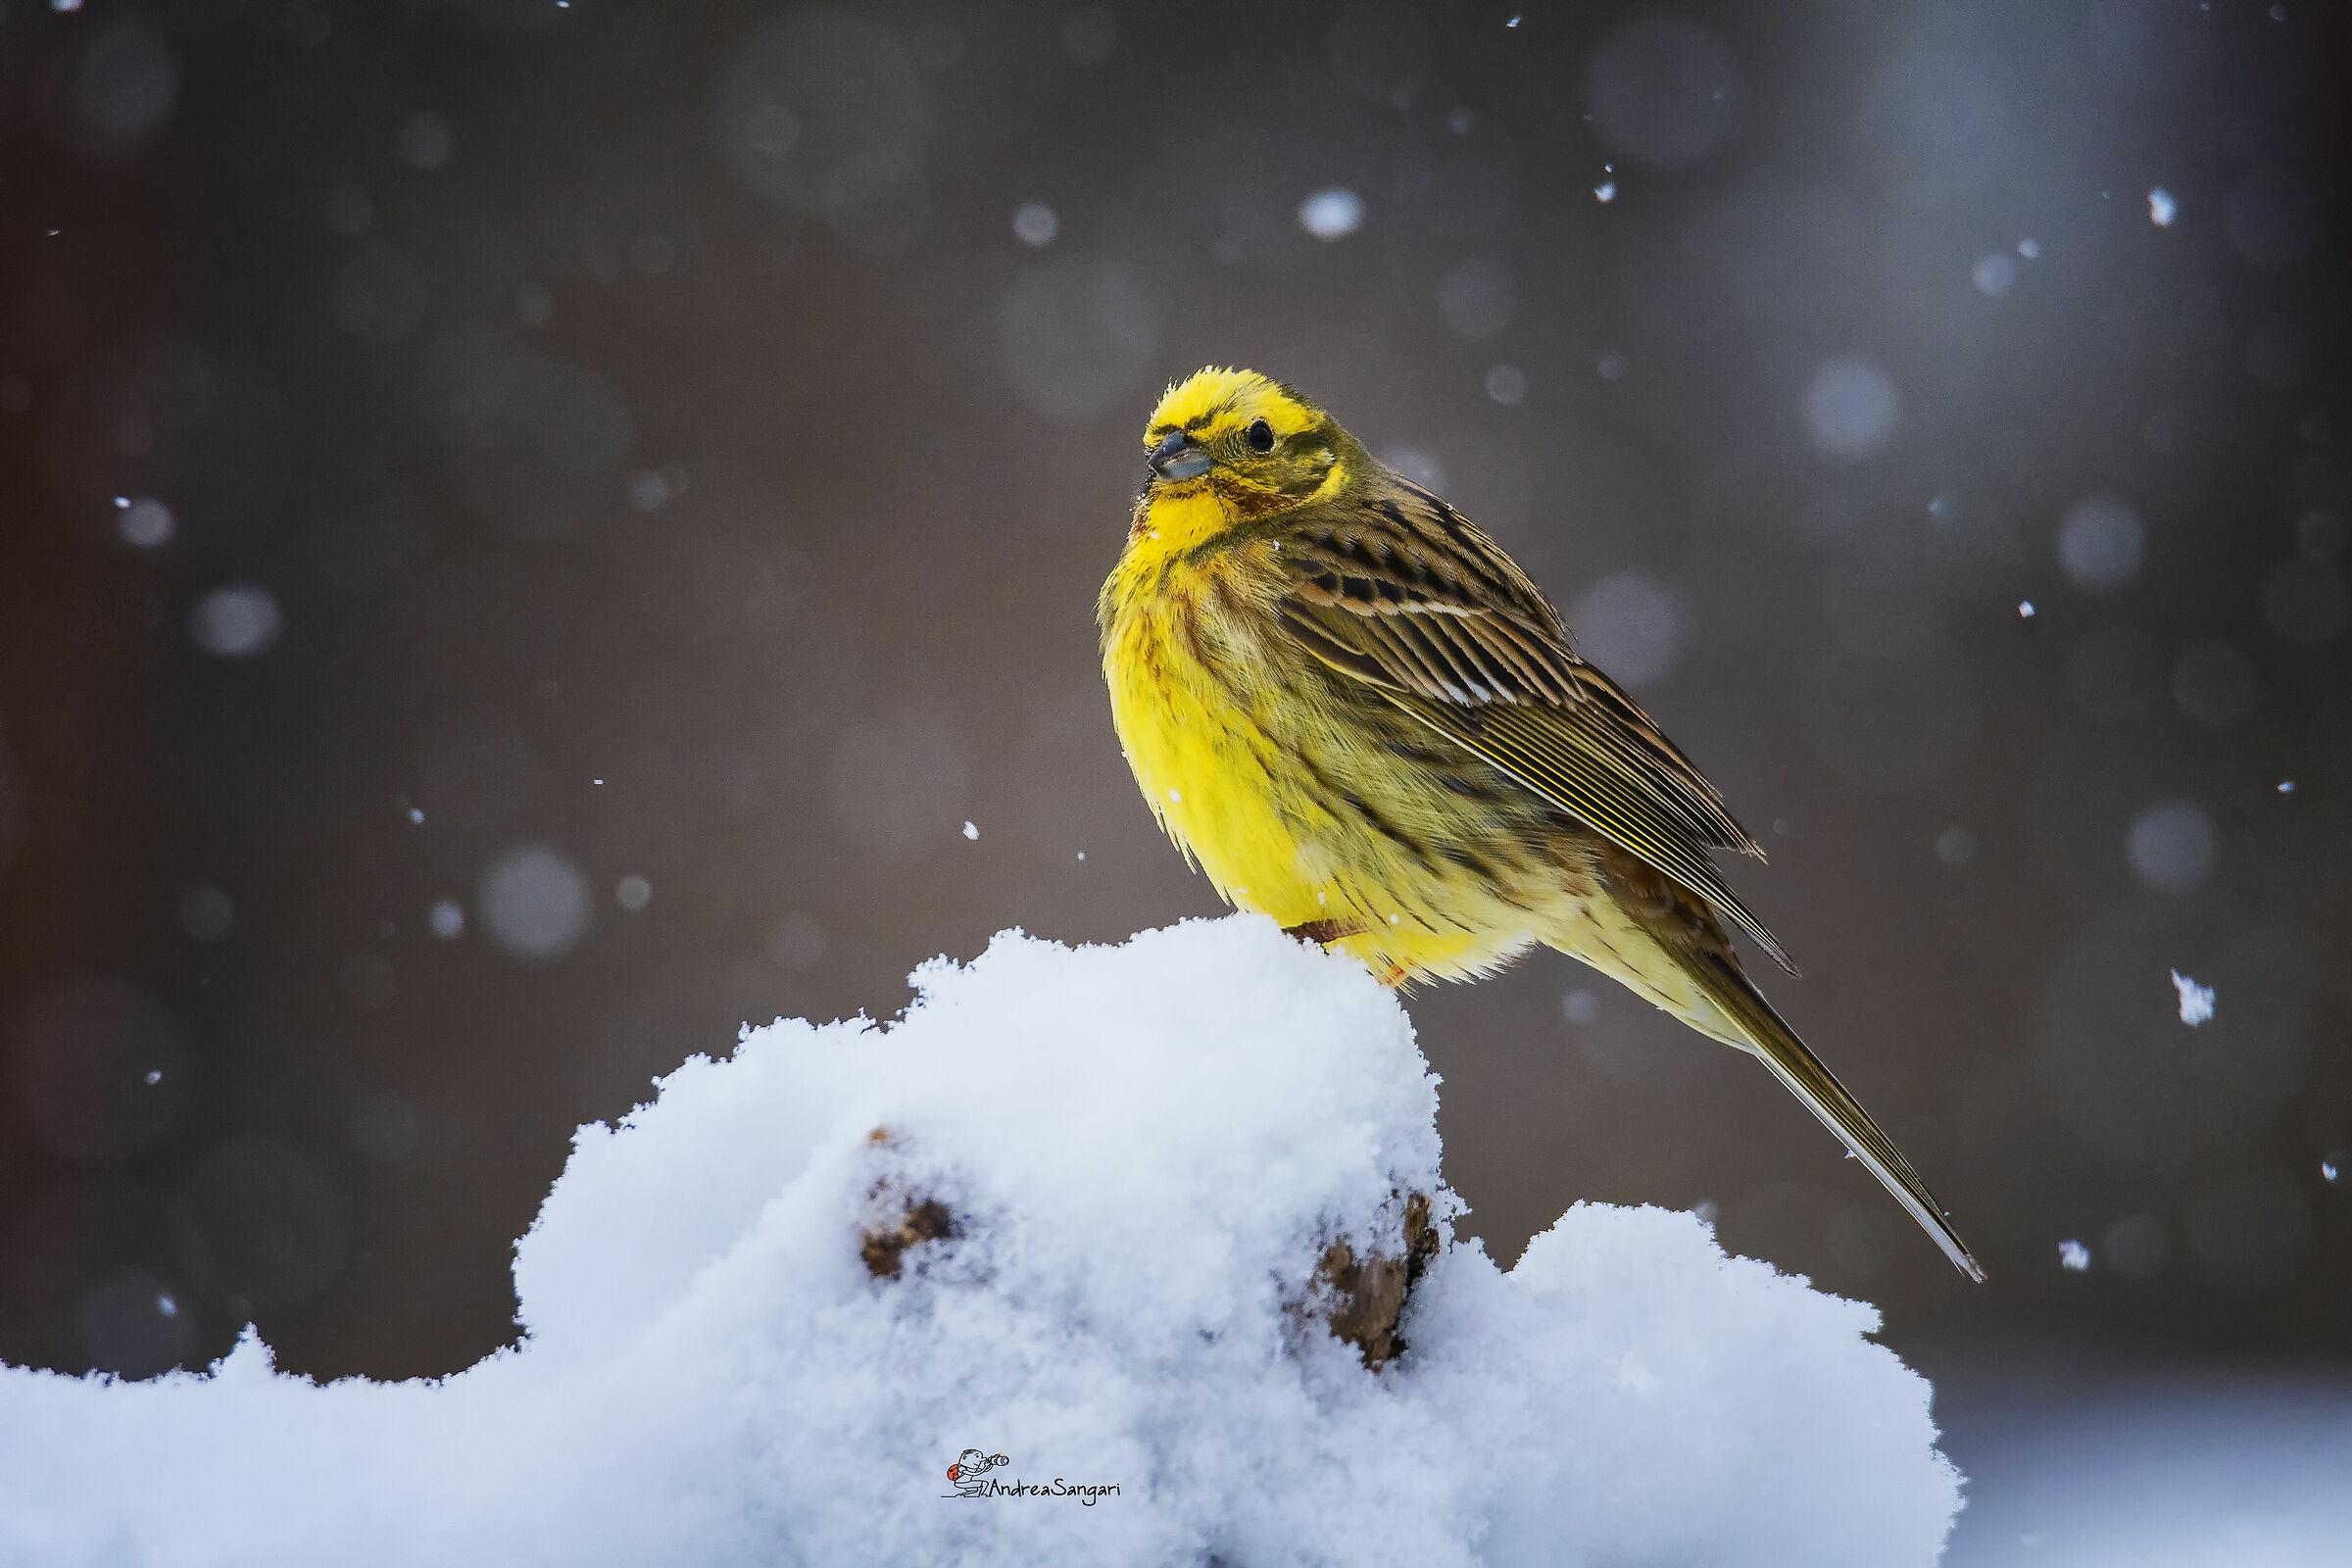 The snow brings..... a beautiful yellow cheekbone...